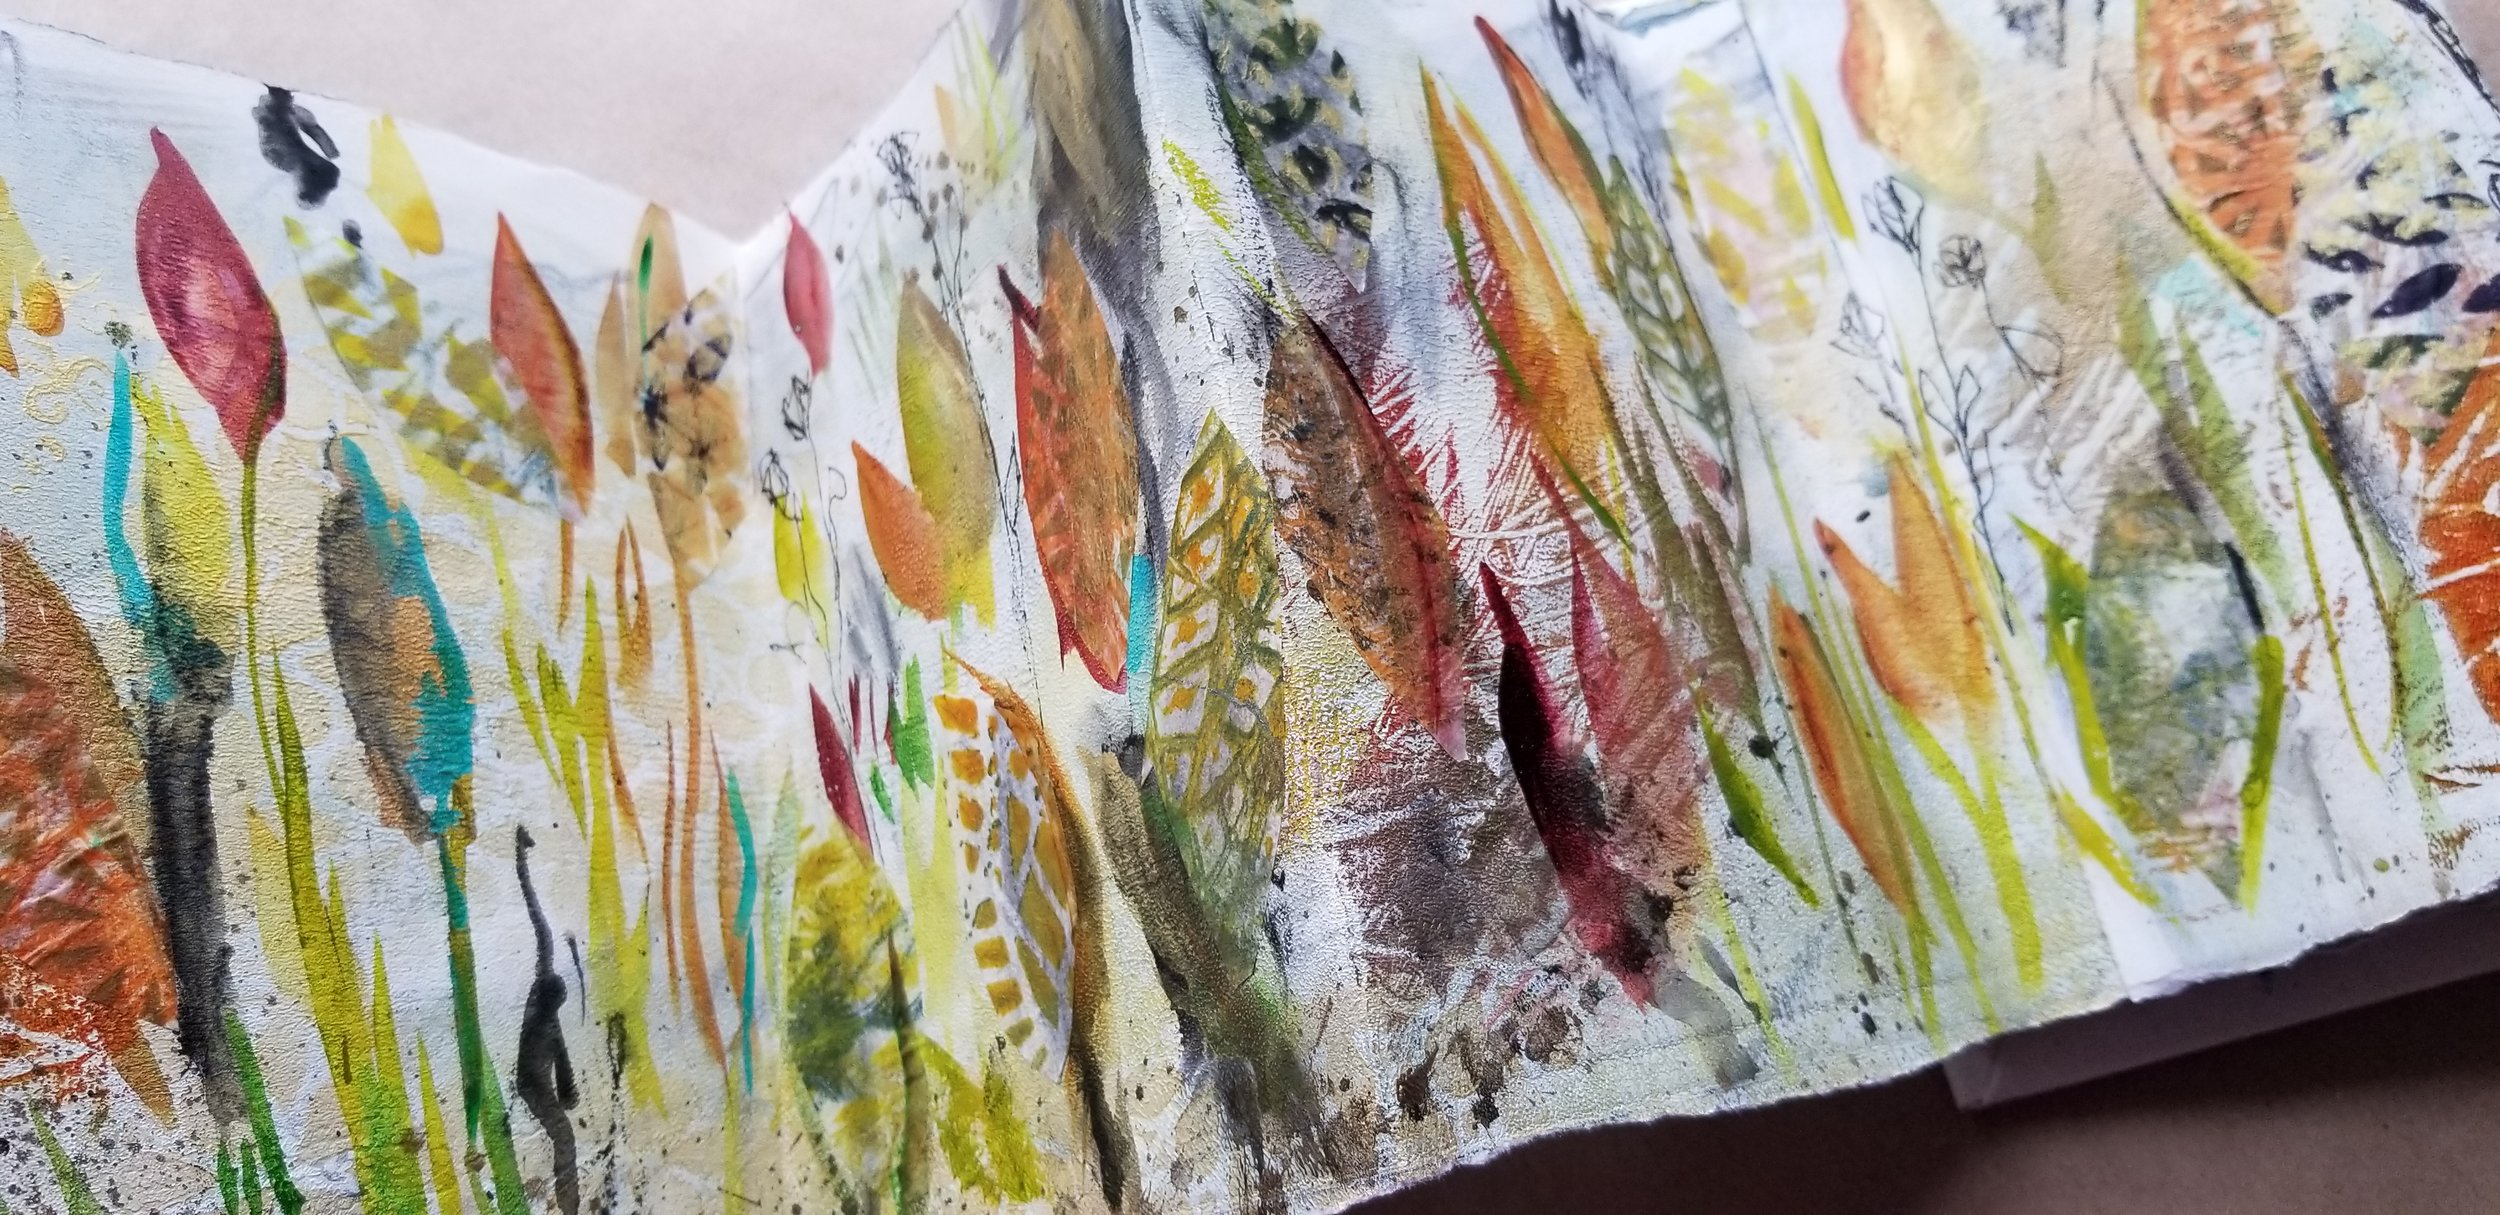 Ubuntu One World Kellee Wynne Studios mixed media concertina art journal 6.jpg